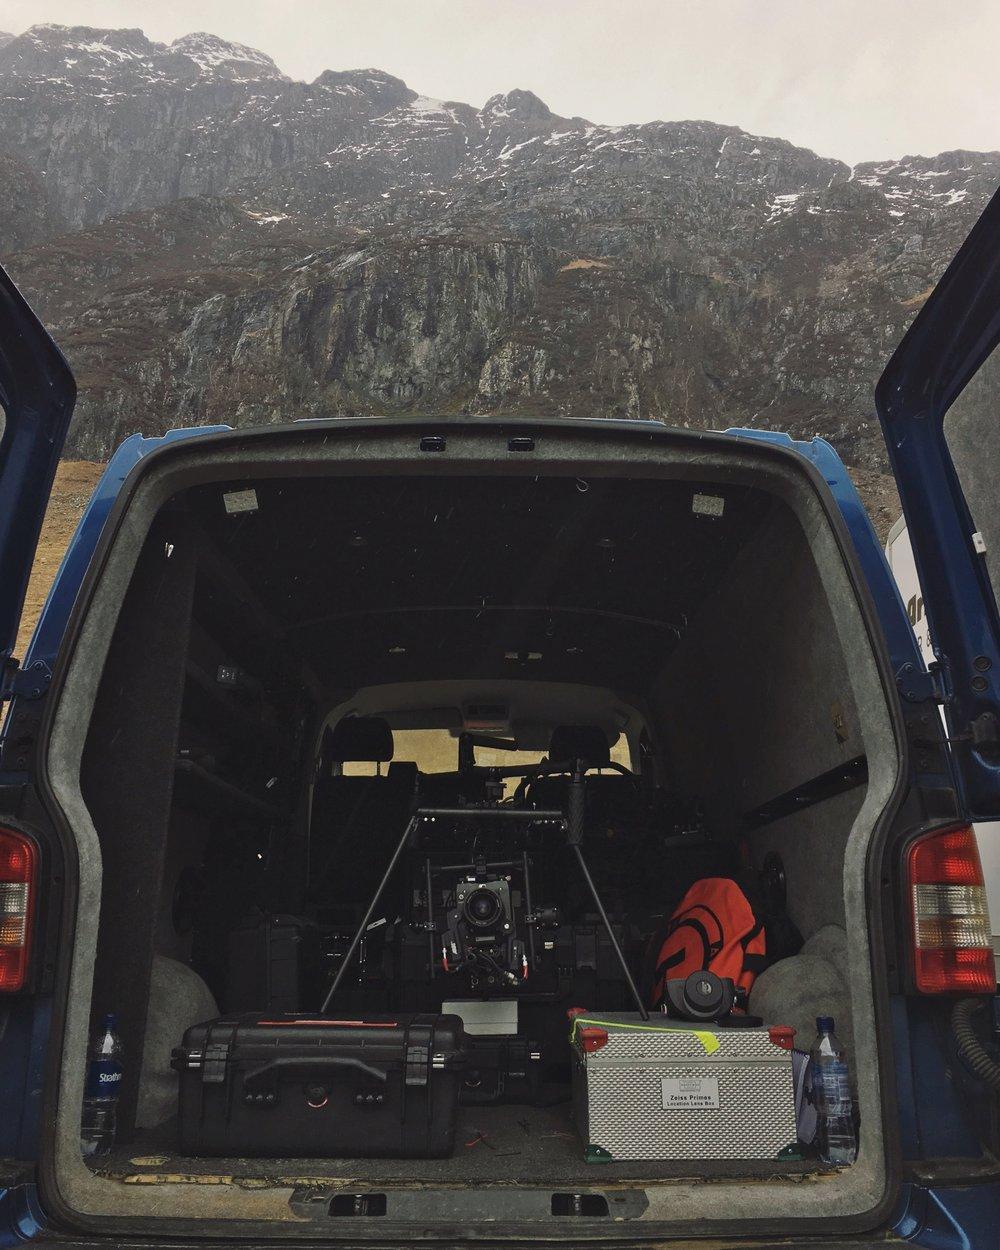 VW Alta 8 alexa Mini Movi Pro